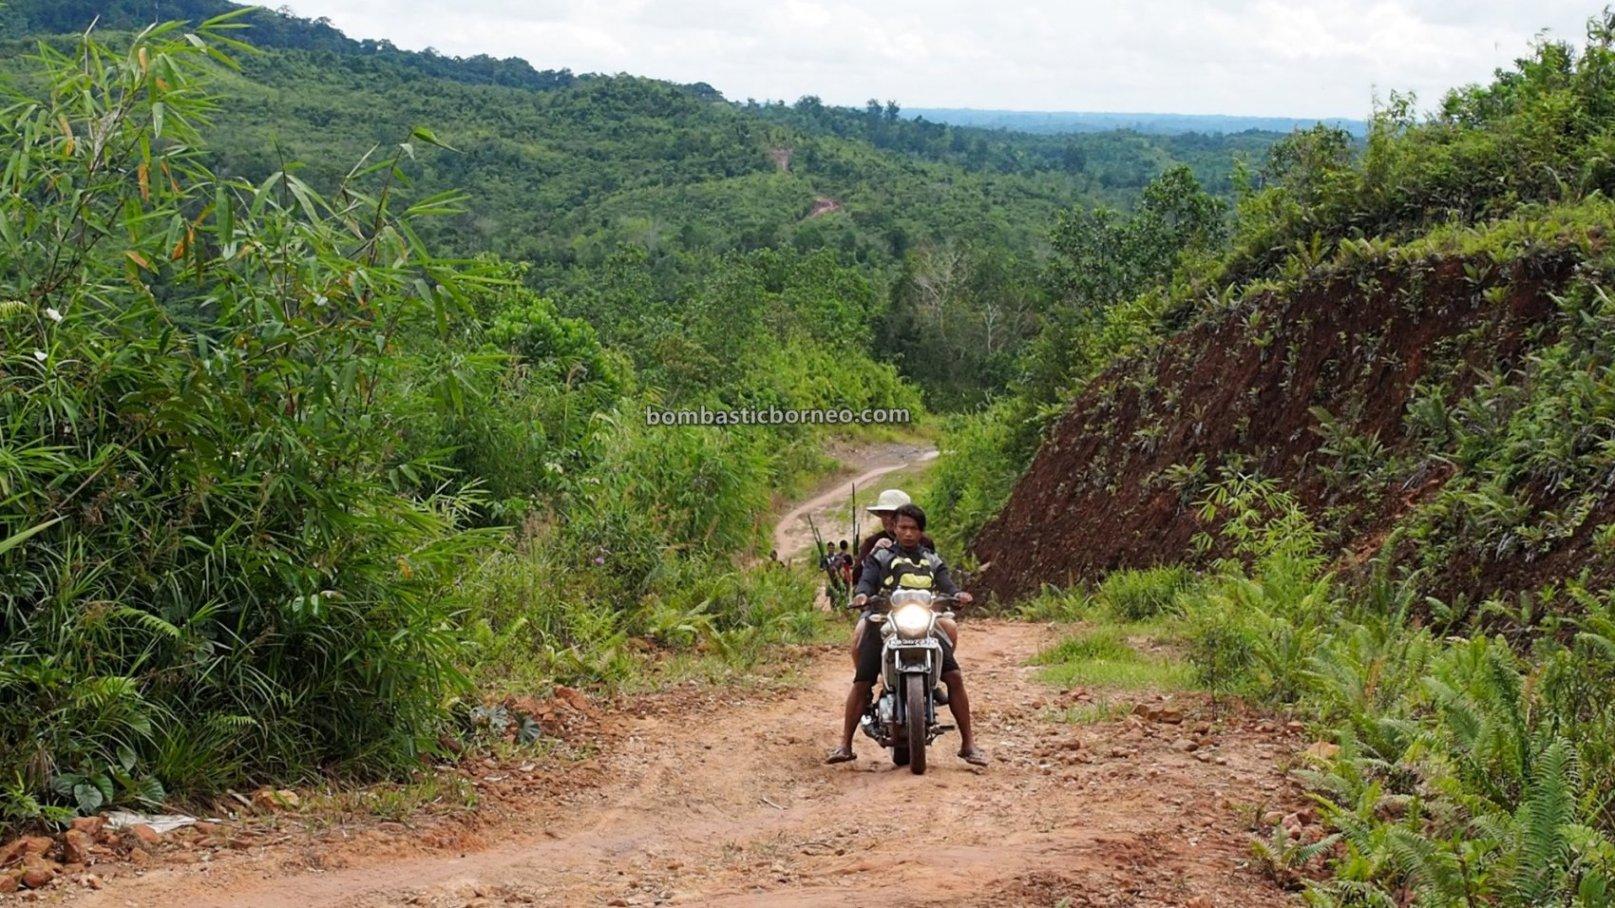 highland, adventure, nature, village, backpackers, exploration, Bengkayang, Siding, native, Dayak Bidayuh, Trans Border, Borneo, 跨境婆罗洲游踪, 印尼西加里曼丹, 孟加映比达友部落